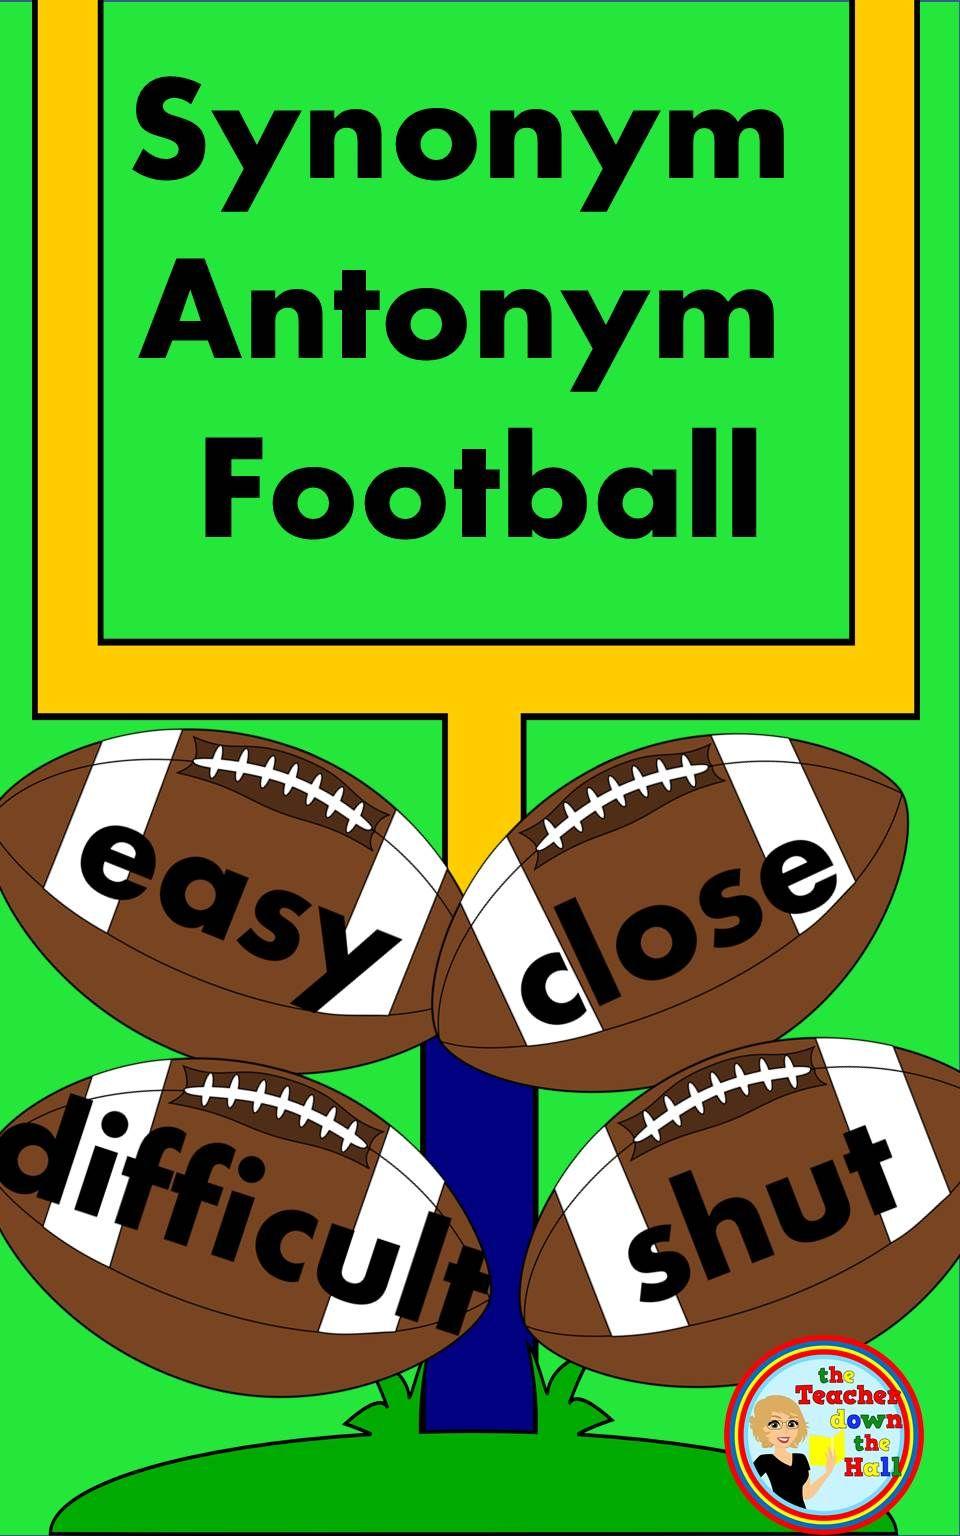 Synonym And Antonym Football Classroom Vocab Activity Synonyms And Antonyms Vocab Activities Antonym